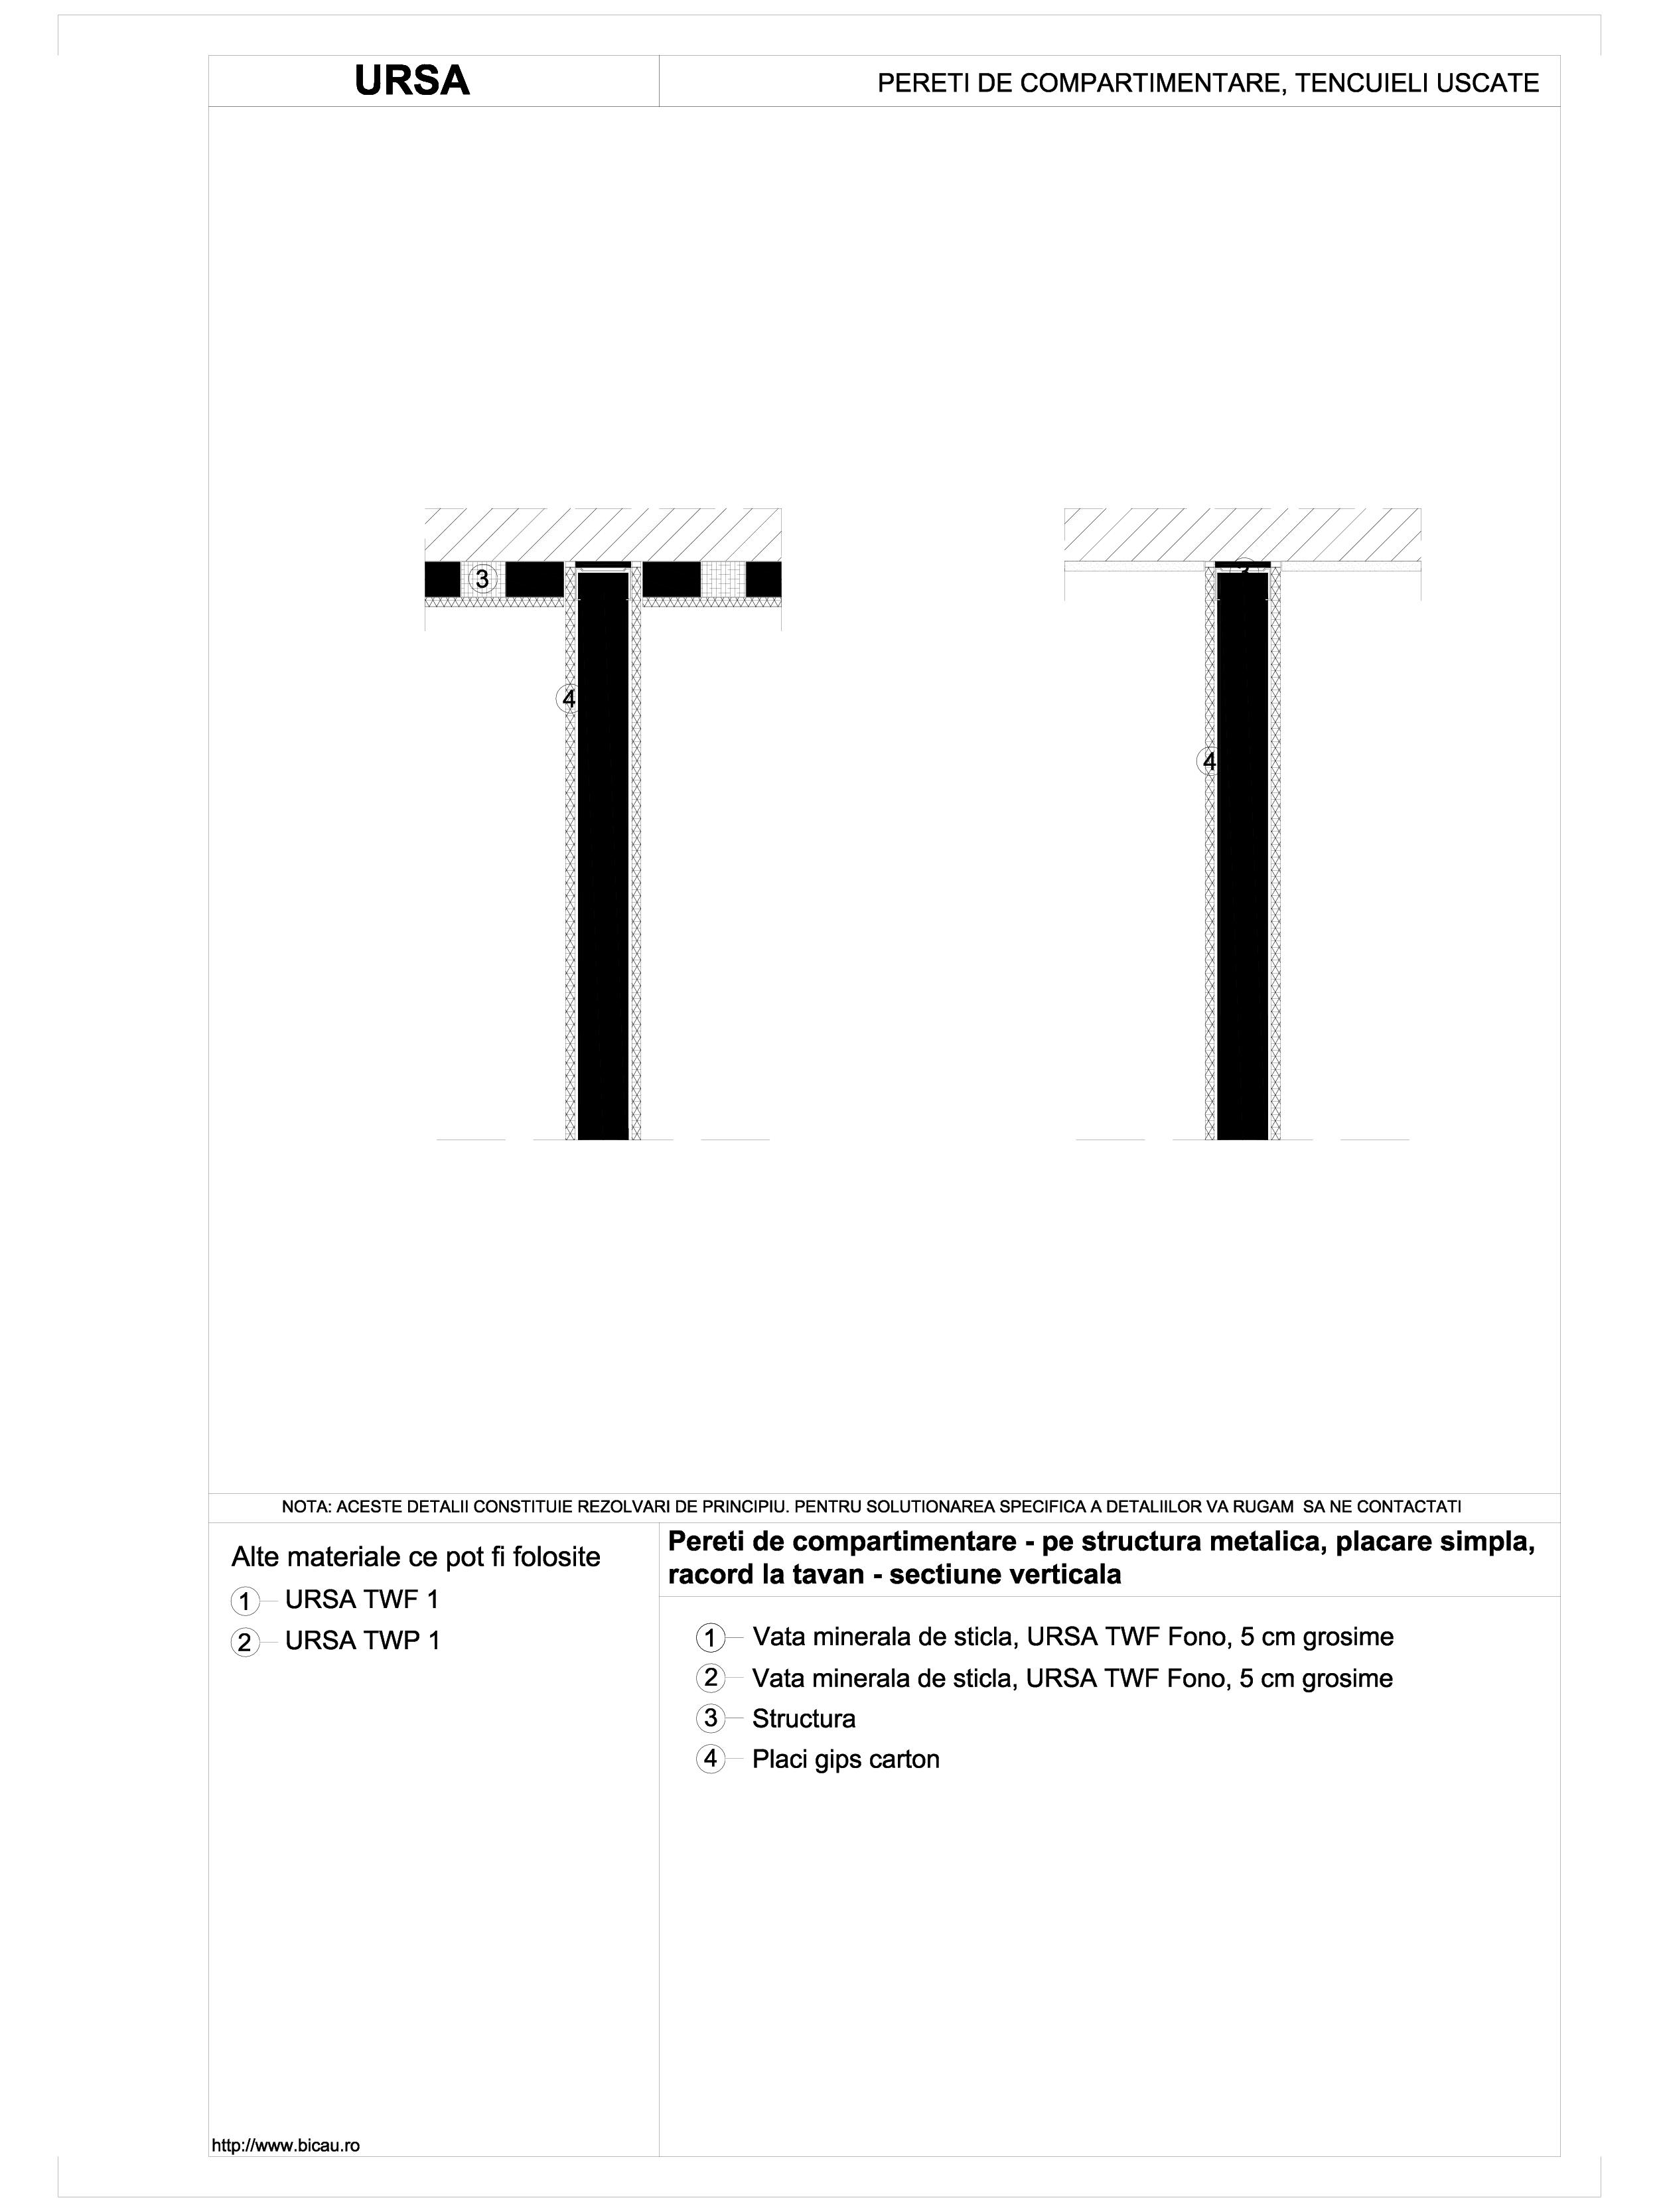 Pereti de compartimentare - pe structura metalica, placare simpla, racord la tavan - sectiune verticala TWF FONO URSA Vata minerala pentru pereti de compartimentare URSA ROMANIA   - Pagina 1